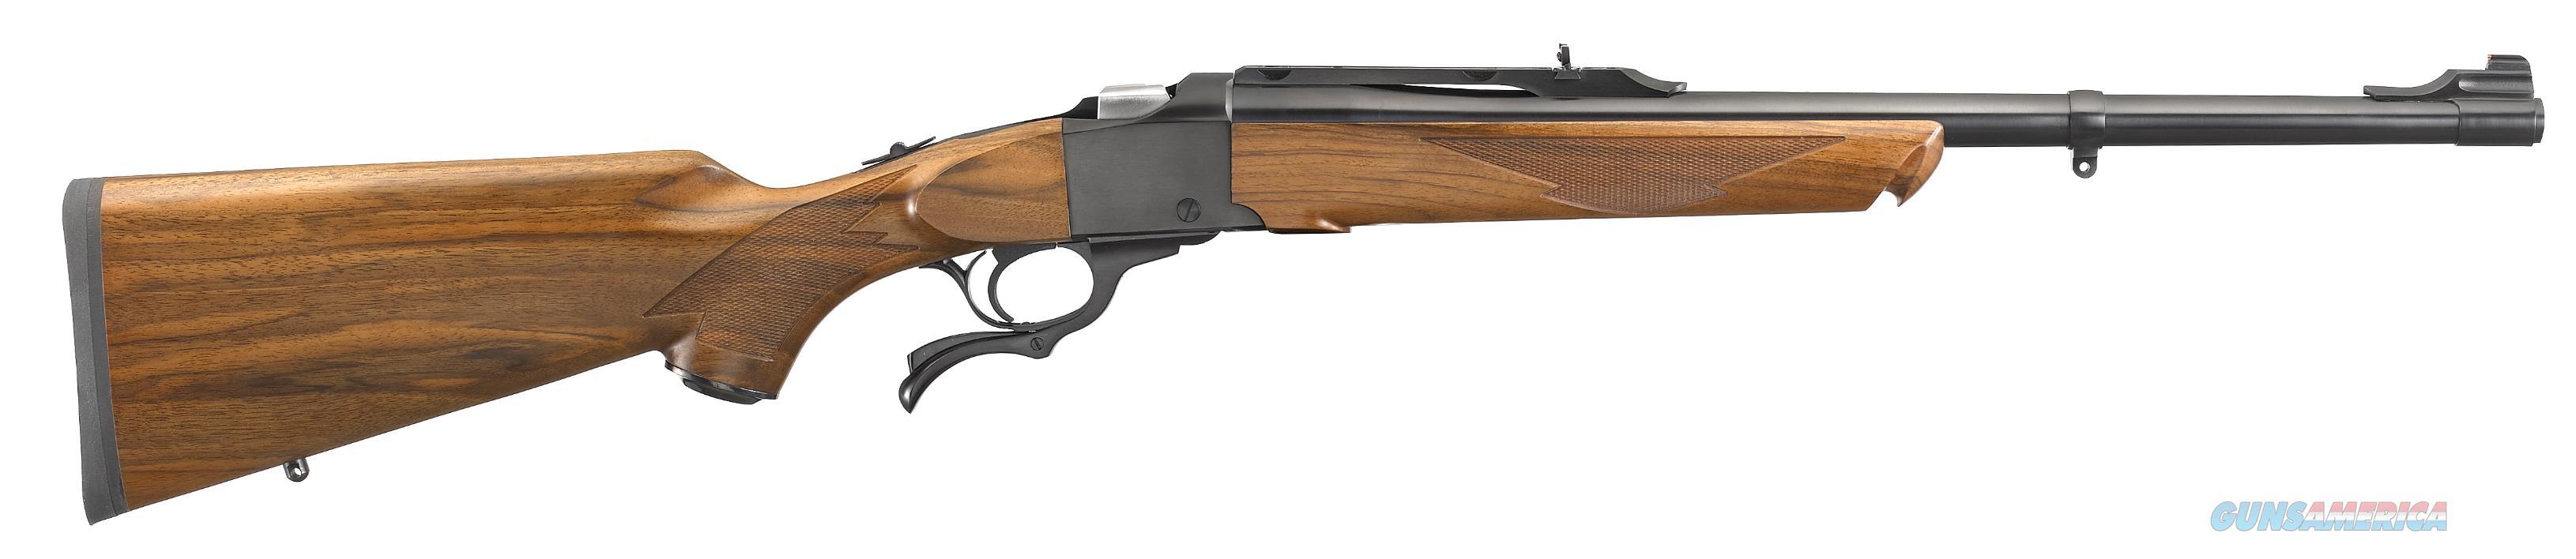 Ruger No 1, Rug 21313 1s Sporter 450 Marlin 20in  Guns > Pistols > 1911 Pistol Copies (non-Colt)